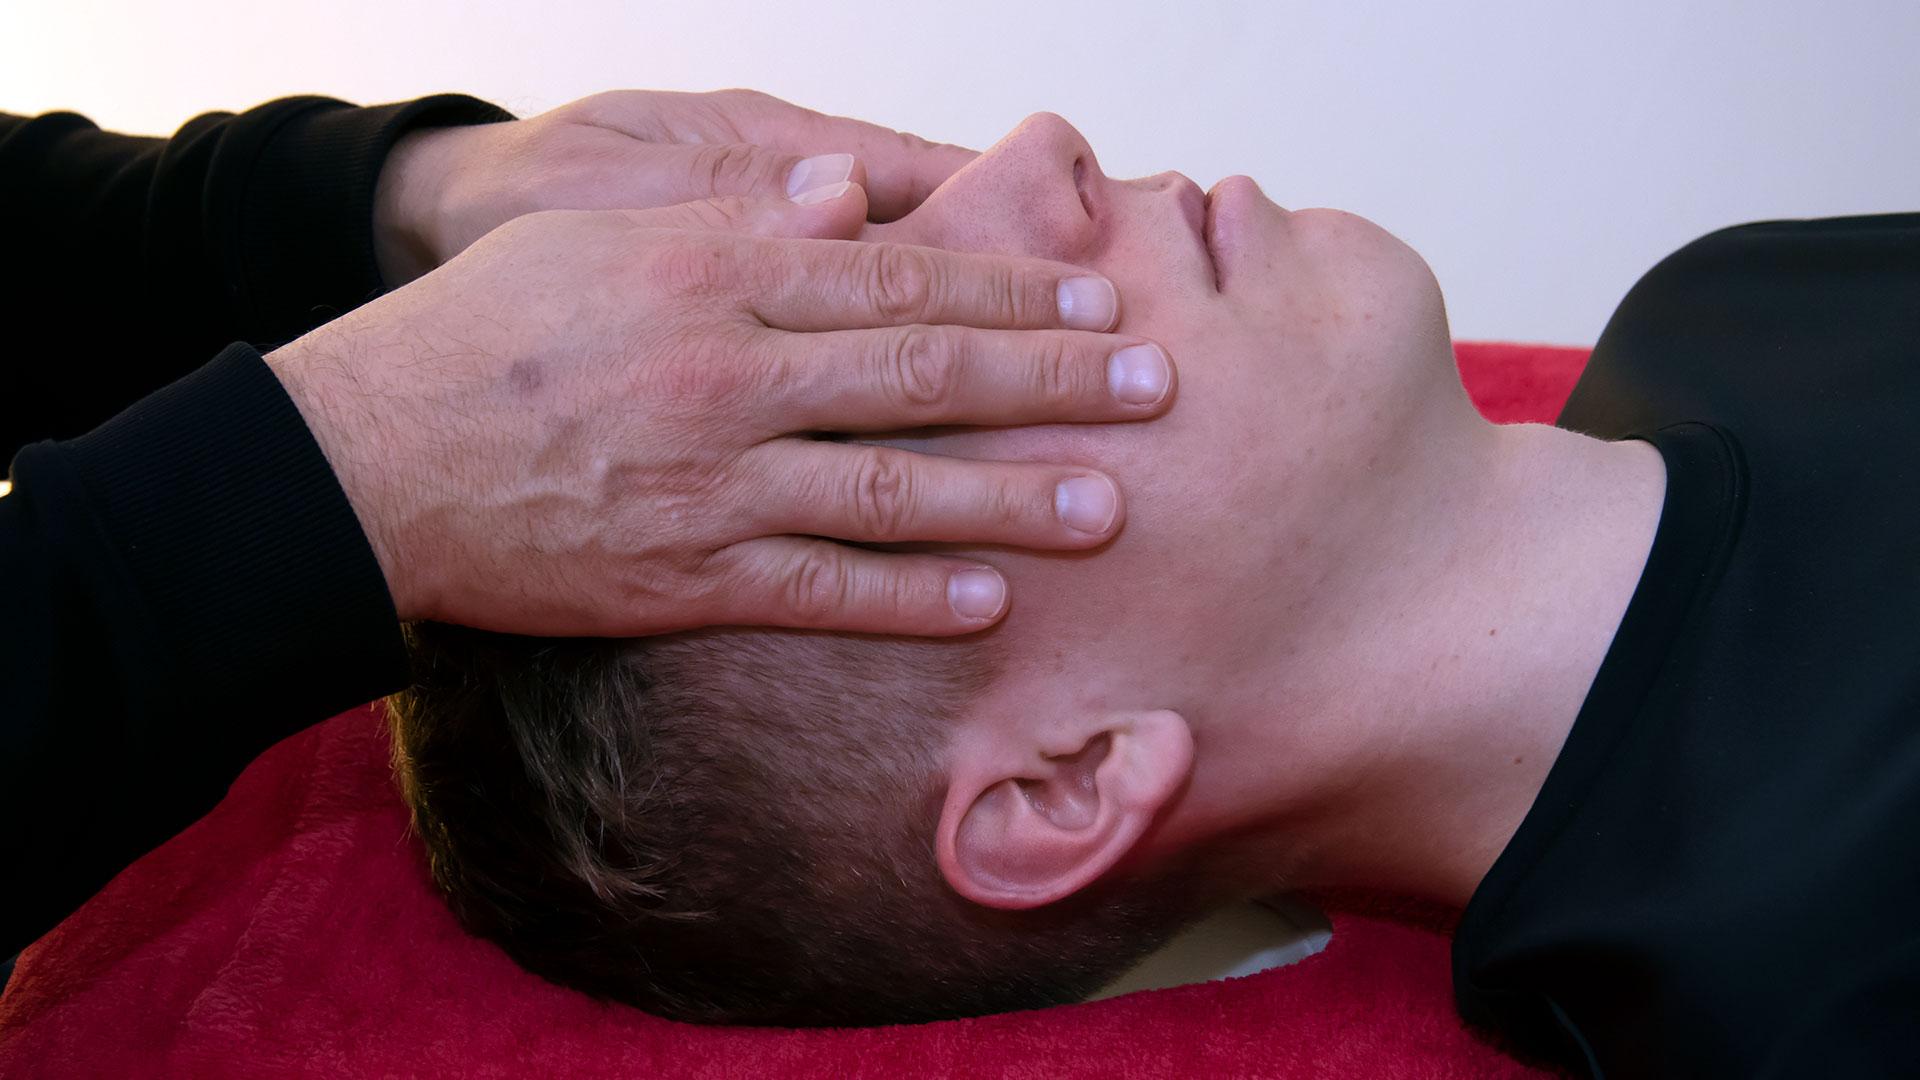 rhoenfit_physiotherapie_kopfdruck_bertsch_020319_02